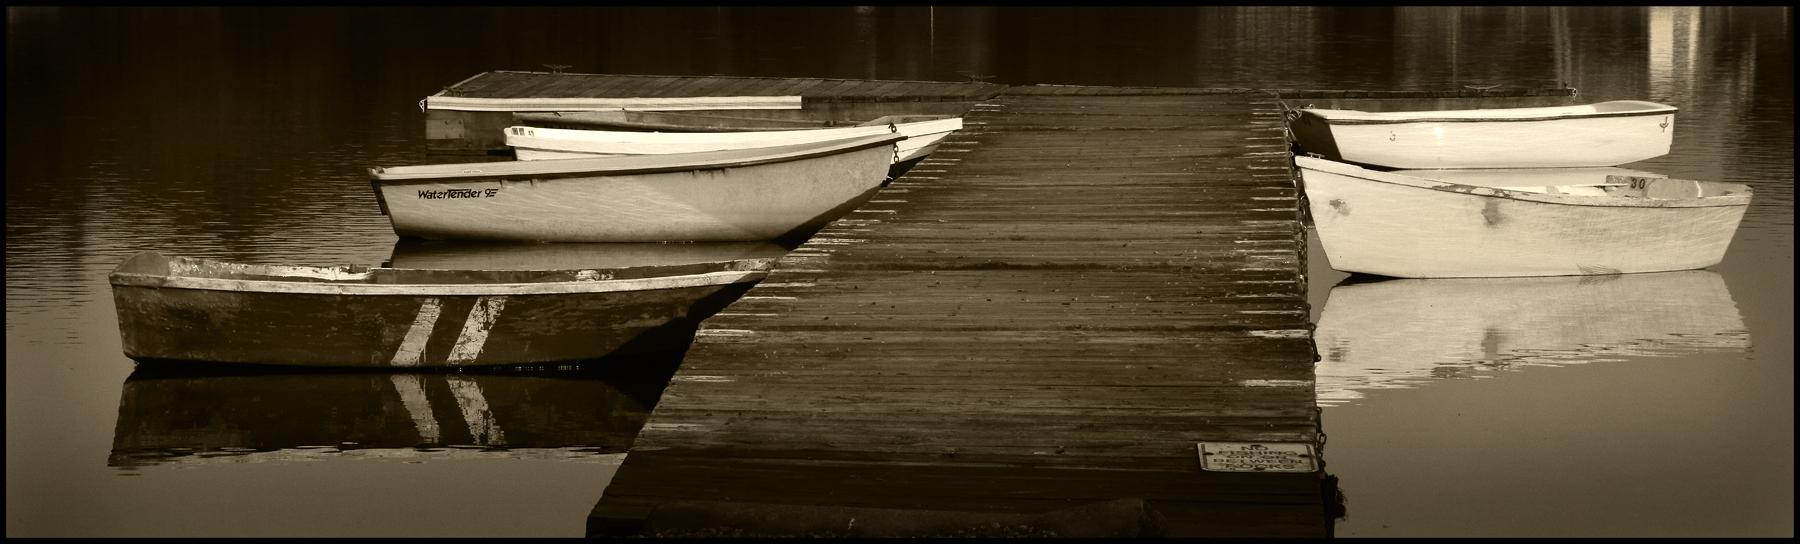 Boats Coveearlylightsepiapano by DonWeston in DonWeston